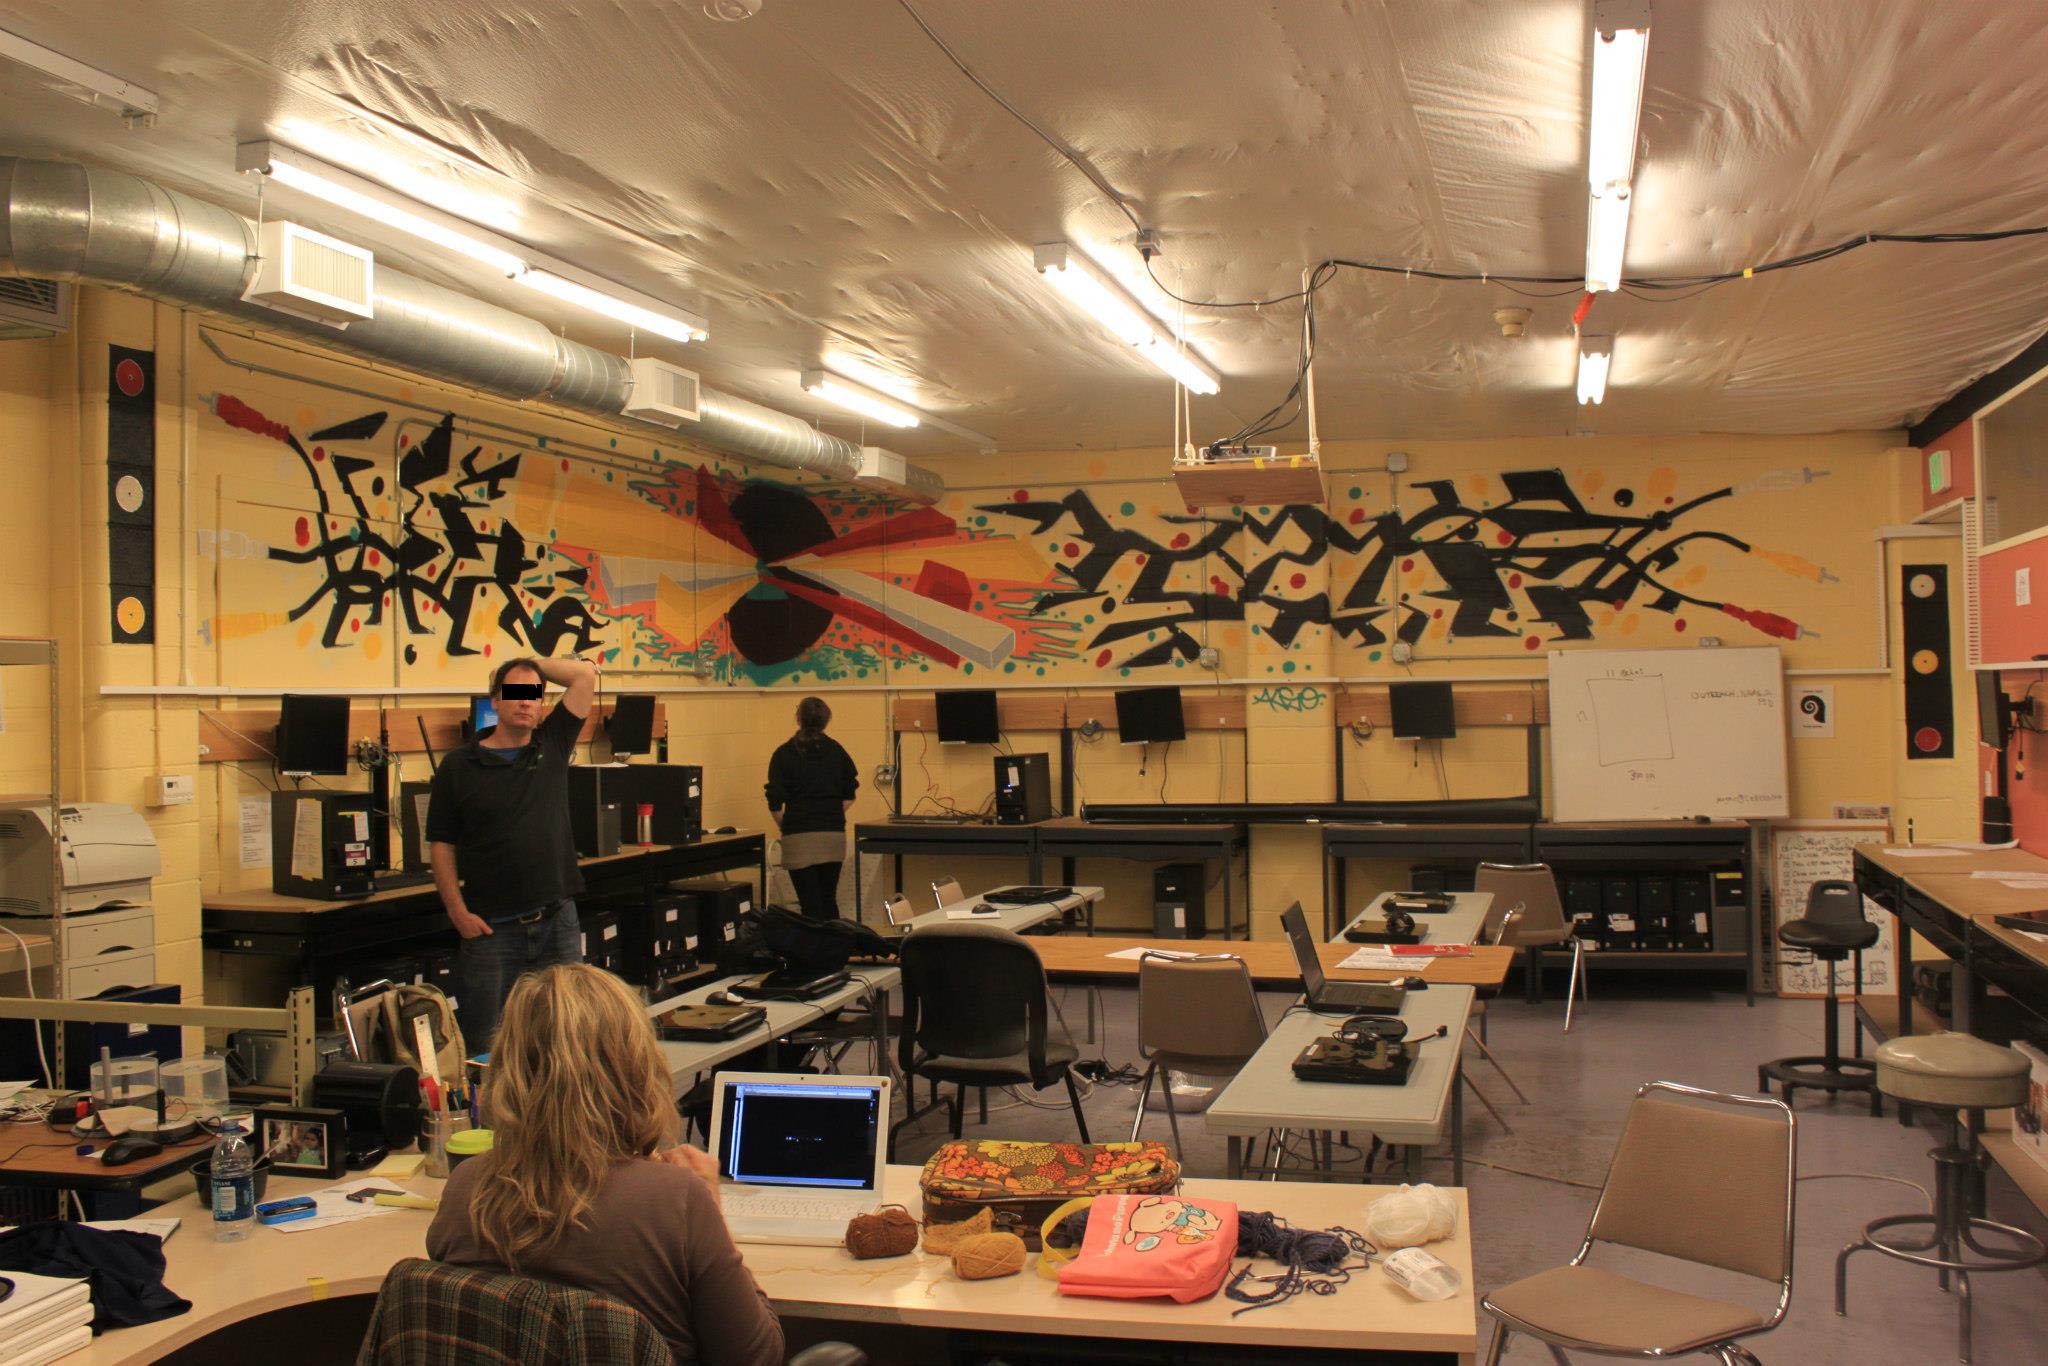 Youth Media School Mural - 2012